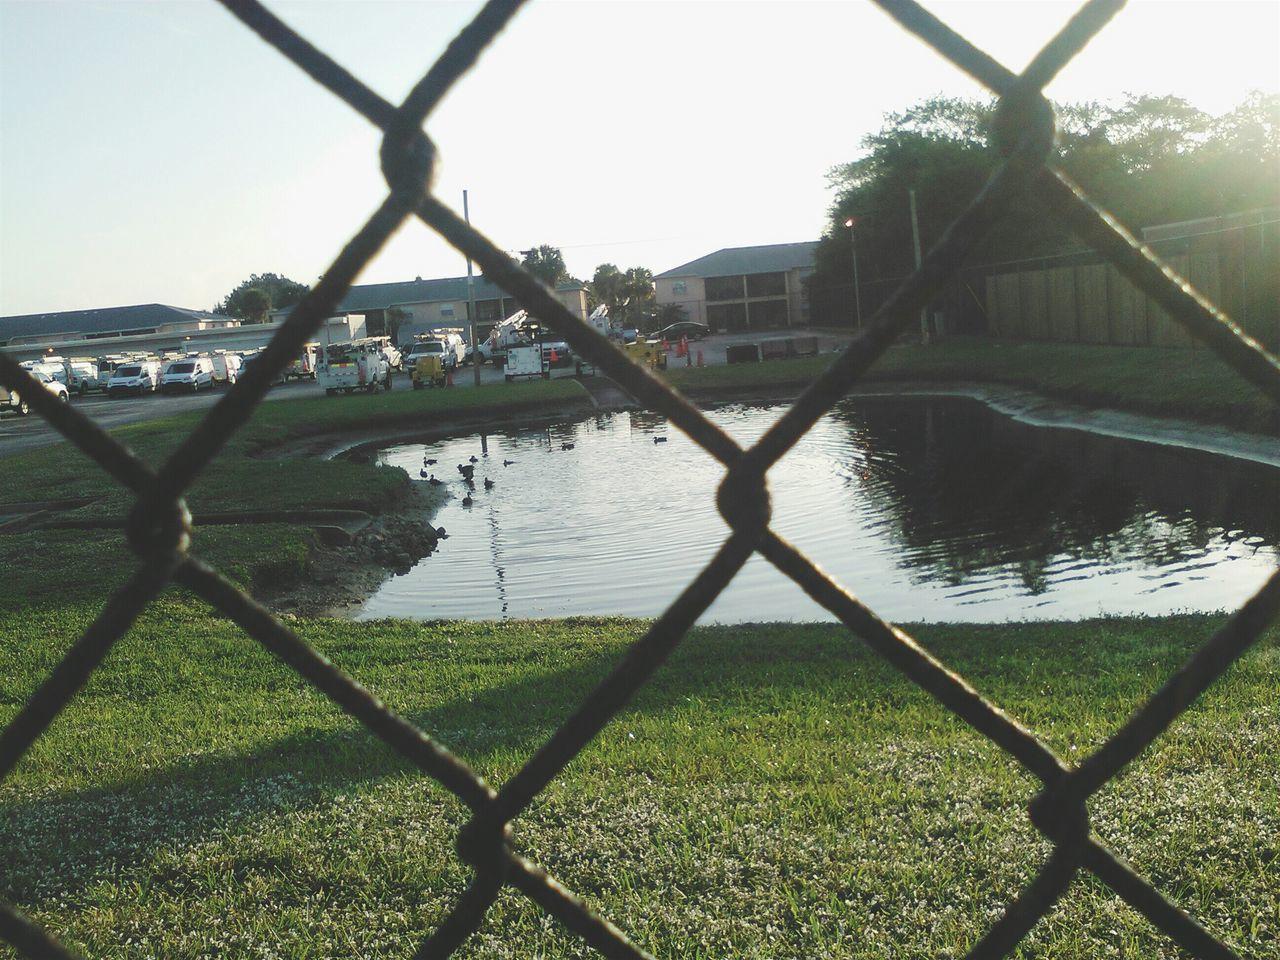 Pond Against Sky Seen Through Chainlink Fence